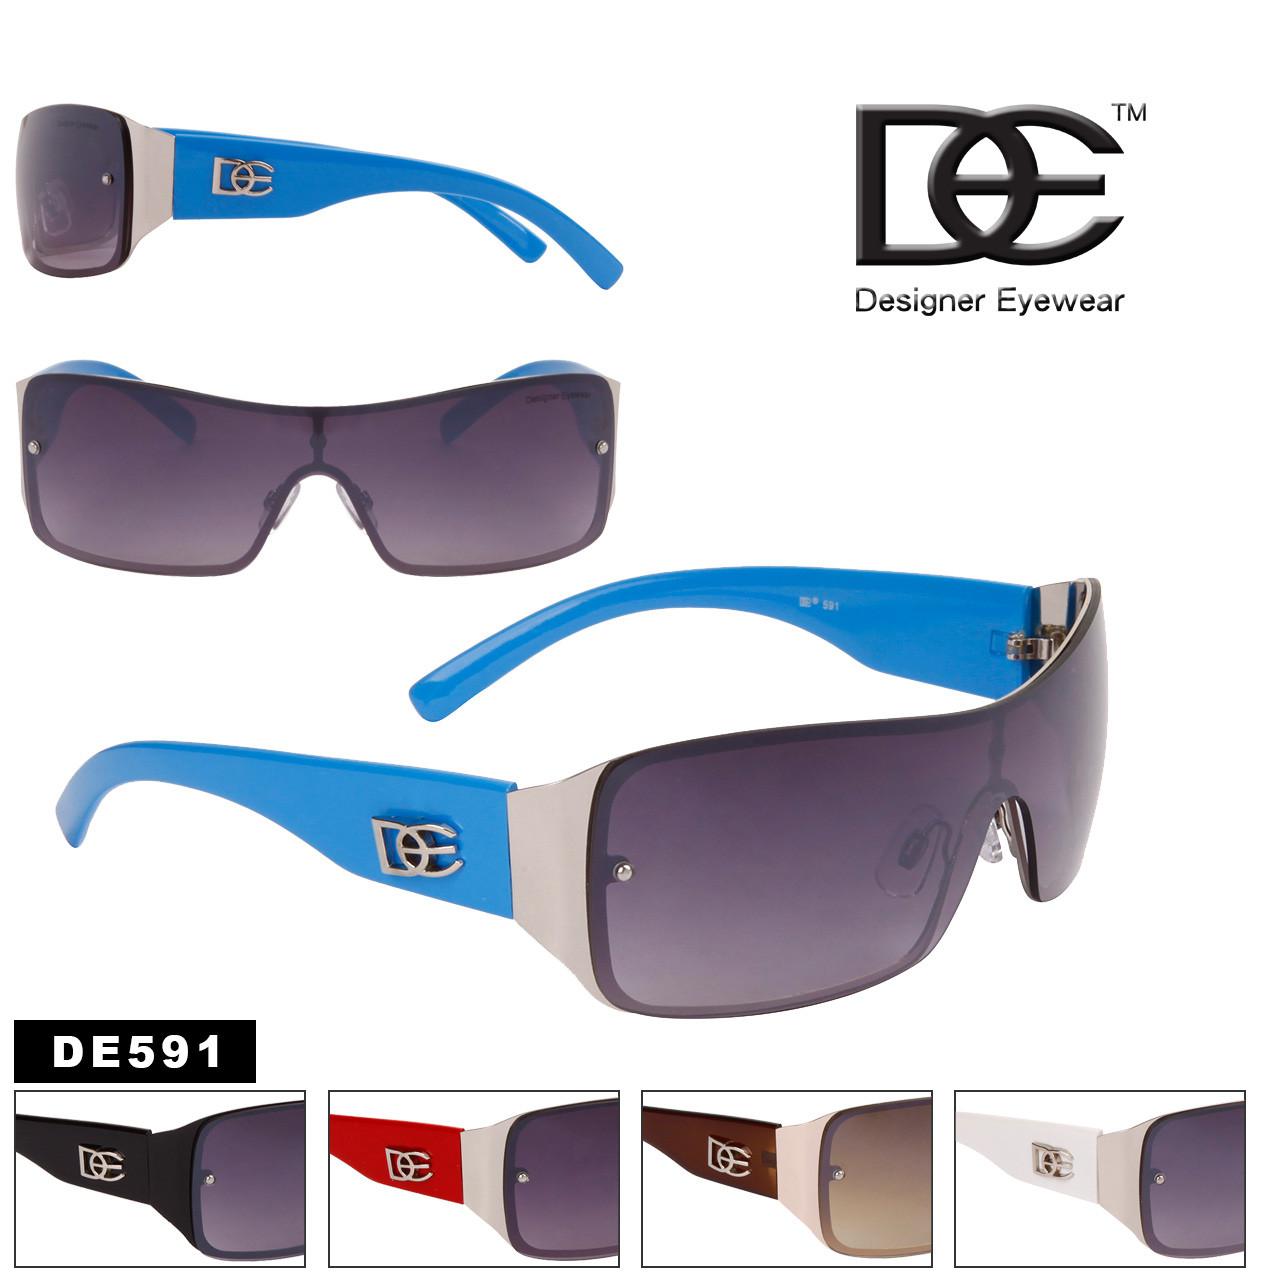 DE™ Designer Eyewear One Piece Lenses Wholesale Sunglasses - Style #DE591